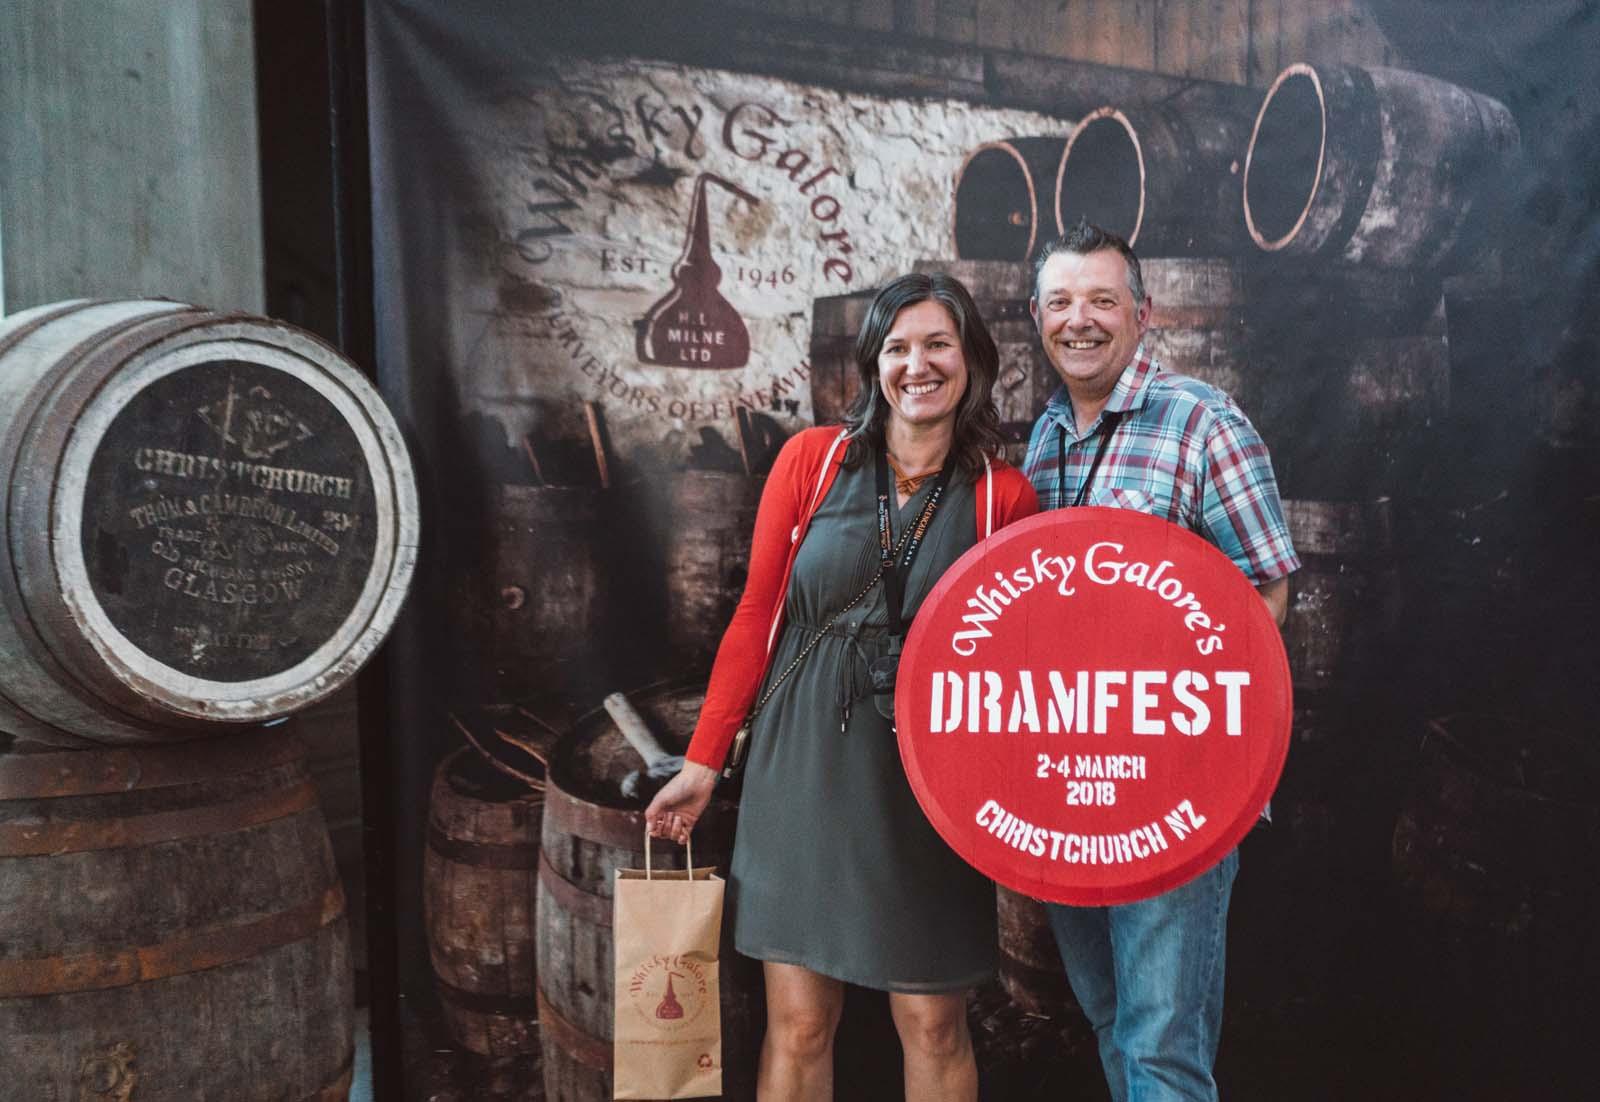 Dramfest 2018 for Whisky Galore-164.jpg